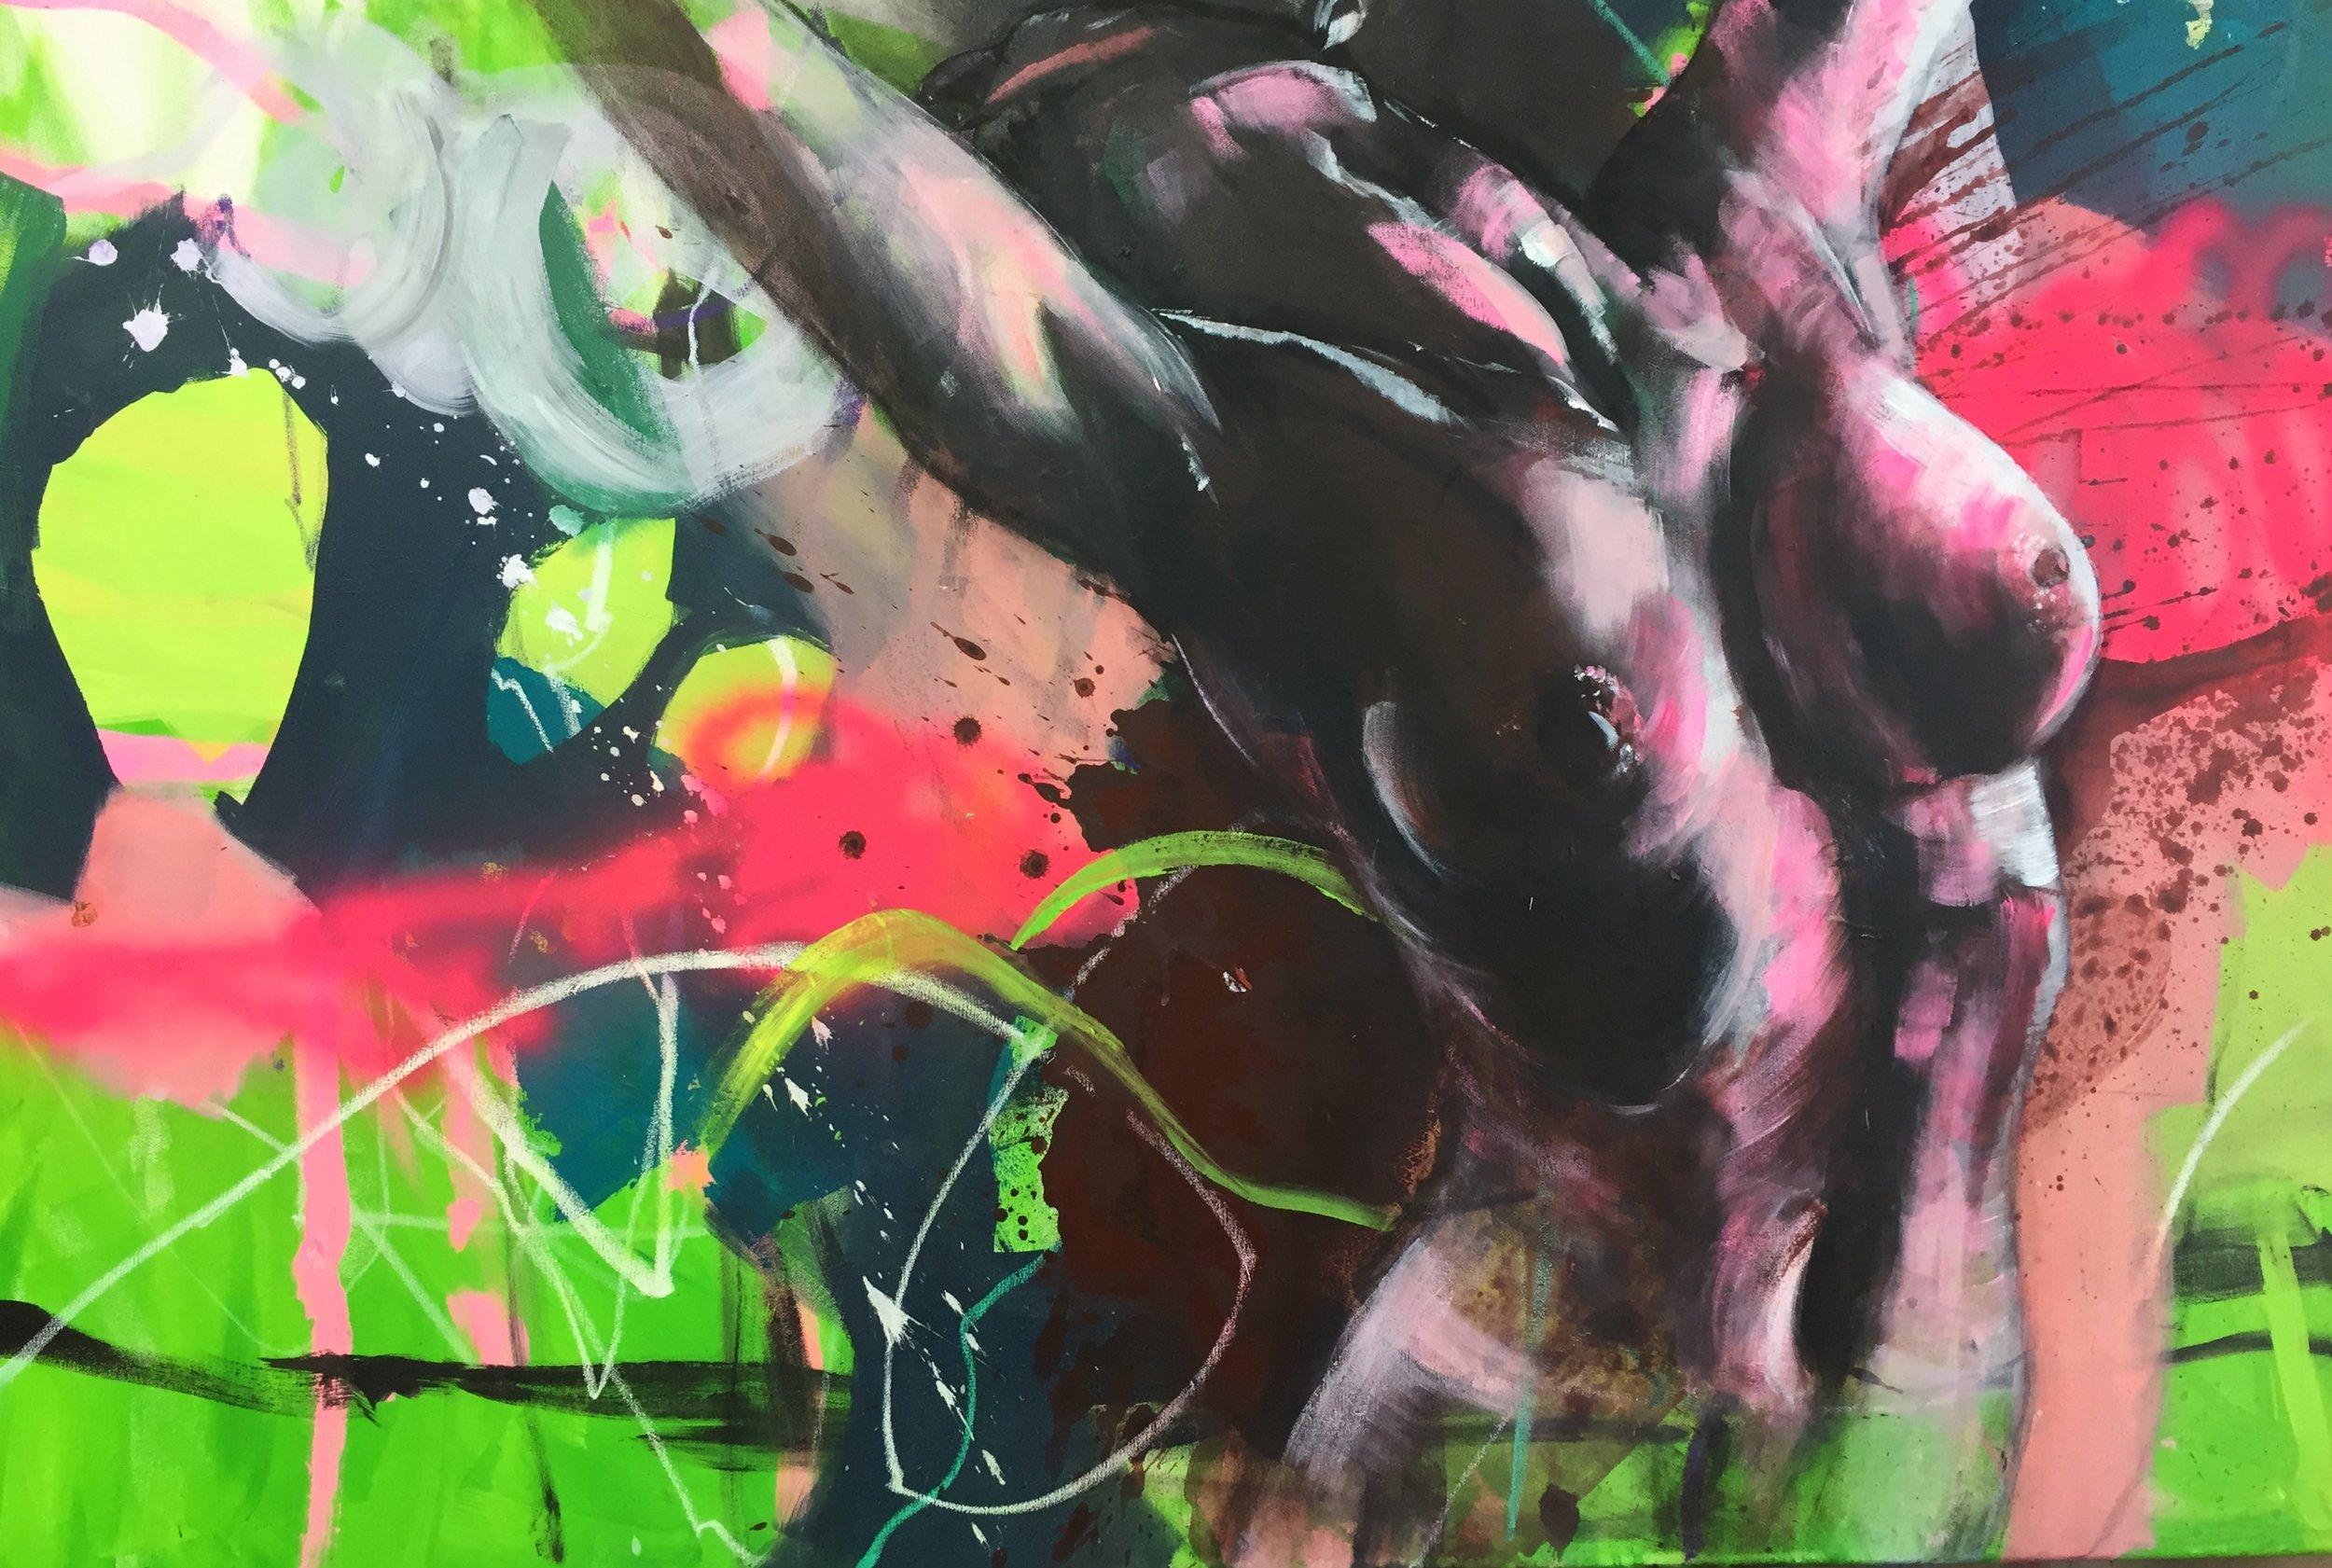 120x80, Acryl auf Leinwand